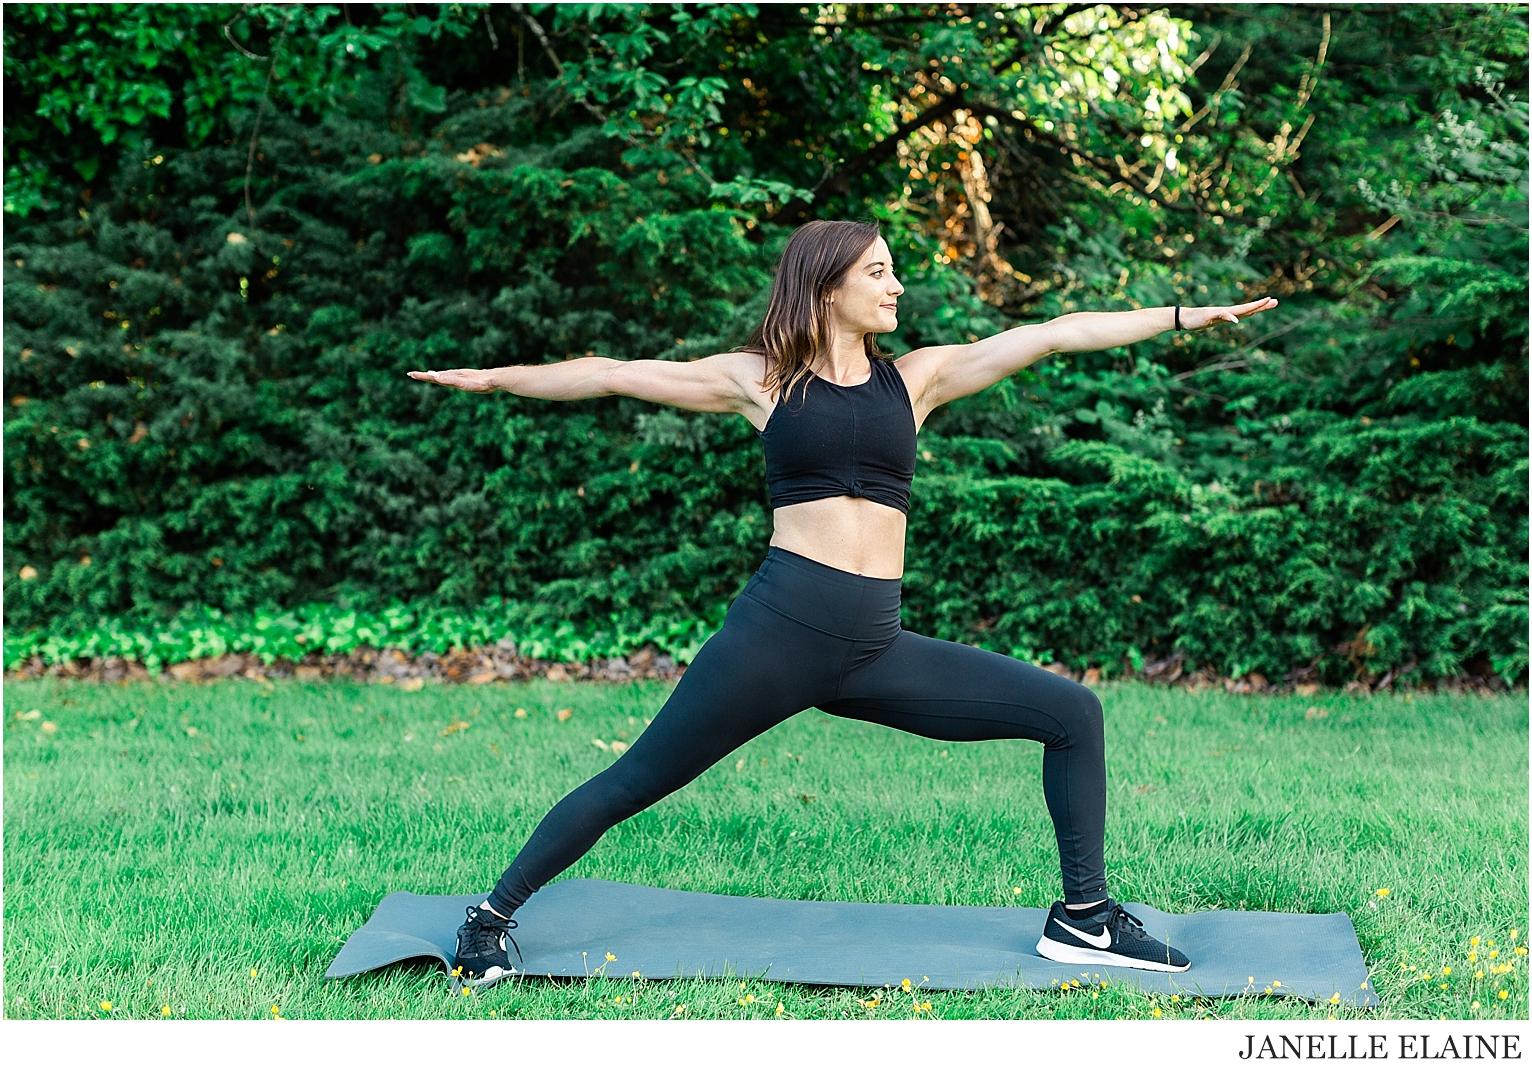 Serena-Yoga Branding-Photo Session-Renton, WA-Janelle Elaine Photography-69.jpg